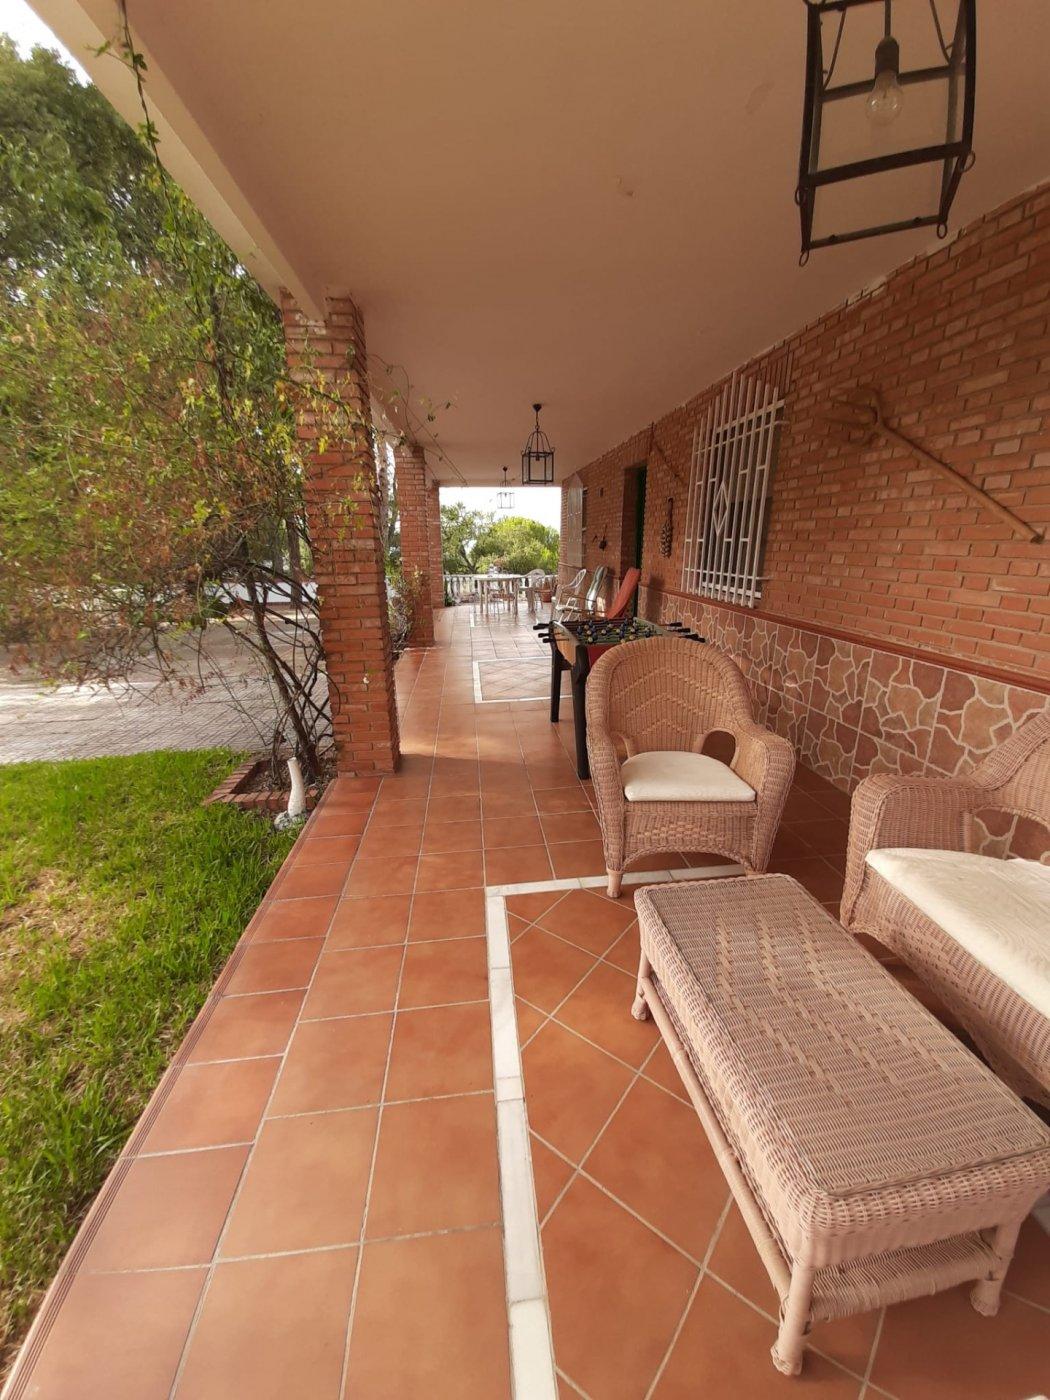 Estupenda casa con piscina propia en zona de assuan- las jaras-cÓrdoba. - imagenInmueble5